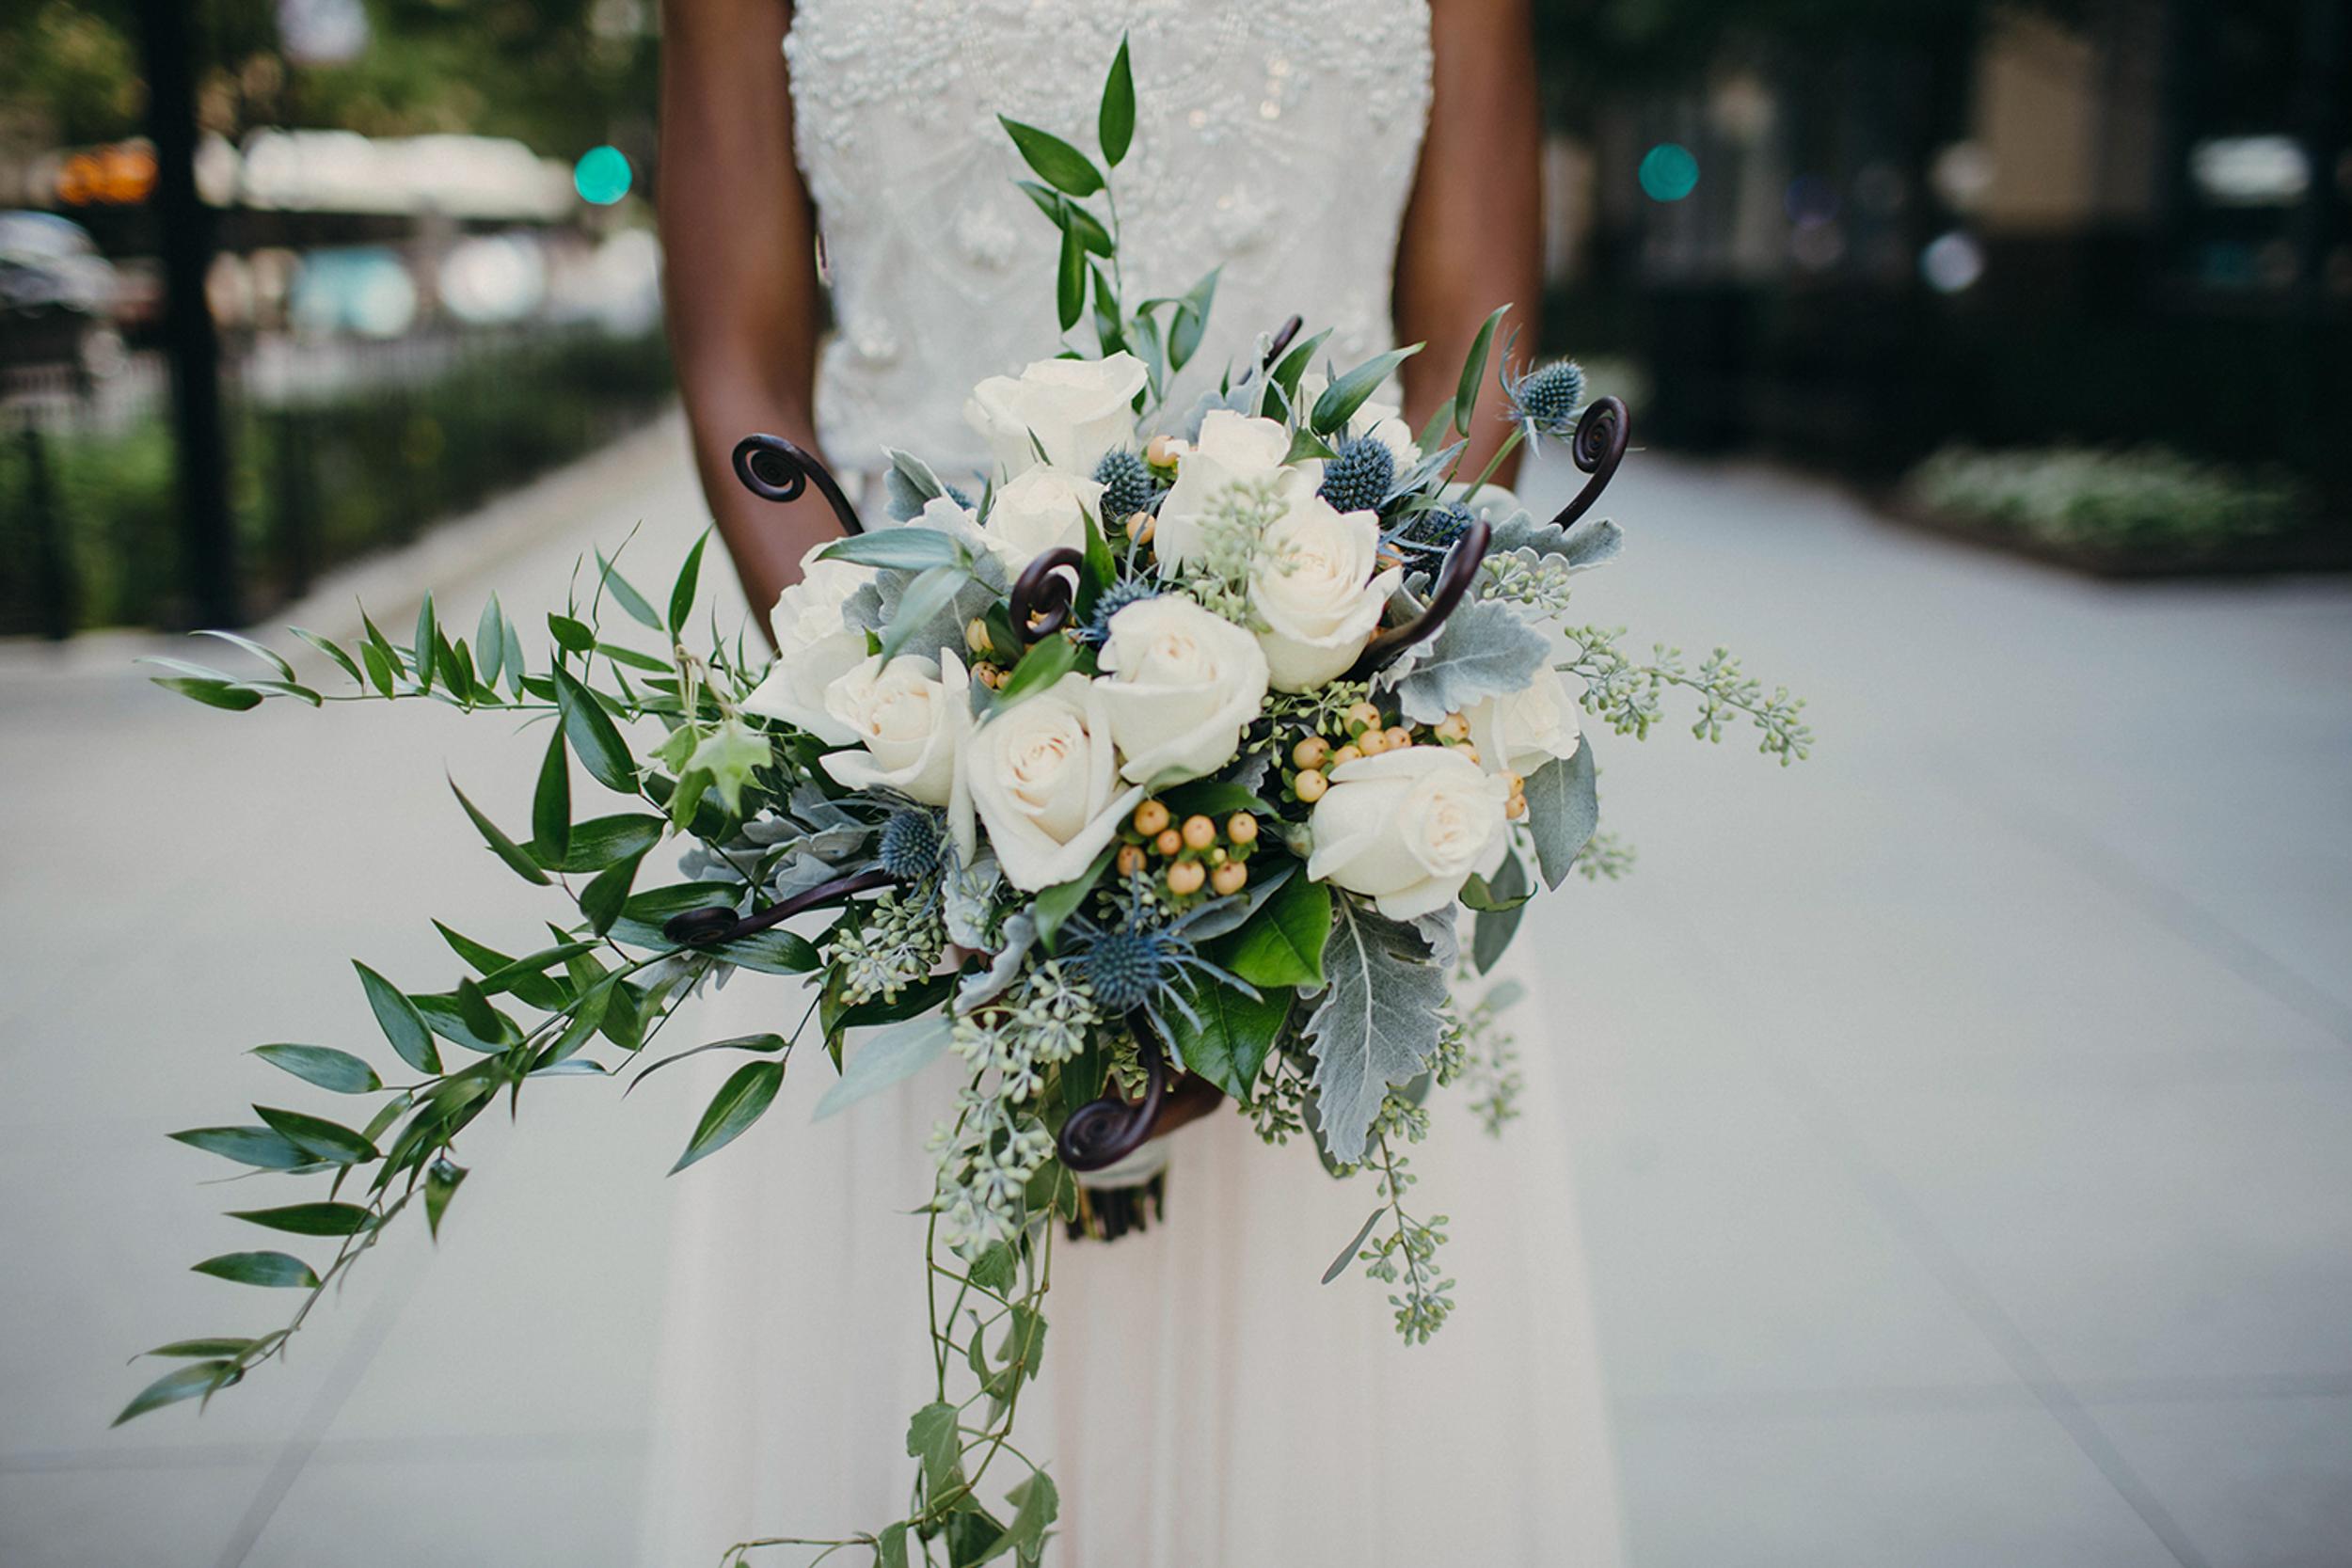 chicago.wedding.urban.intimate.zed451.lake.milton olive park-34.jpg